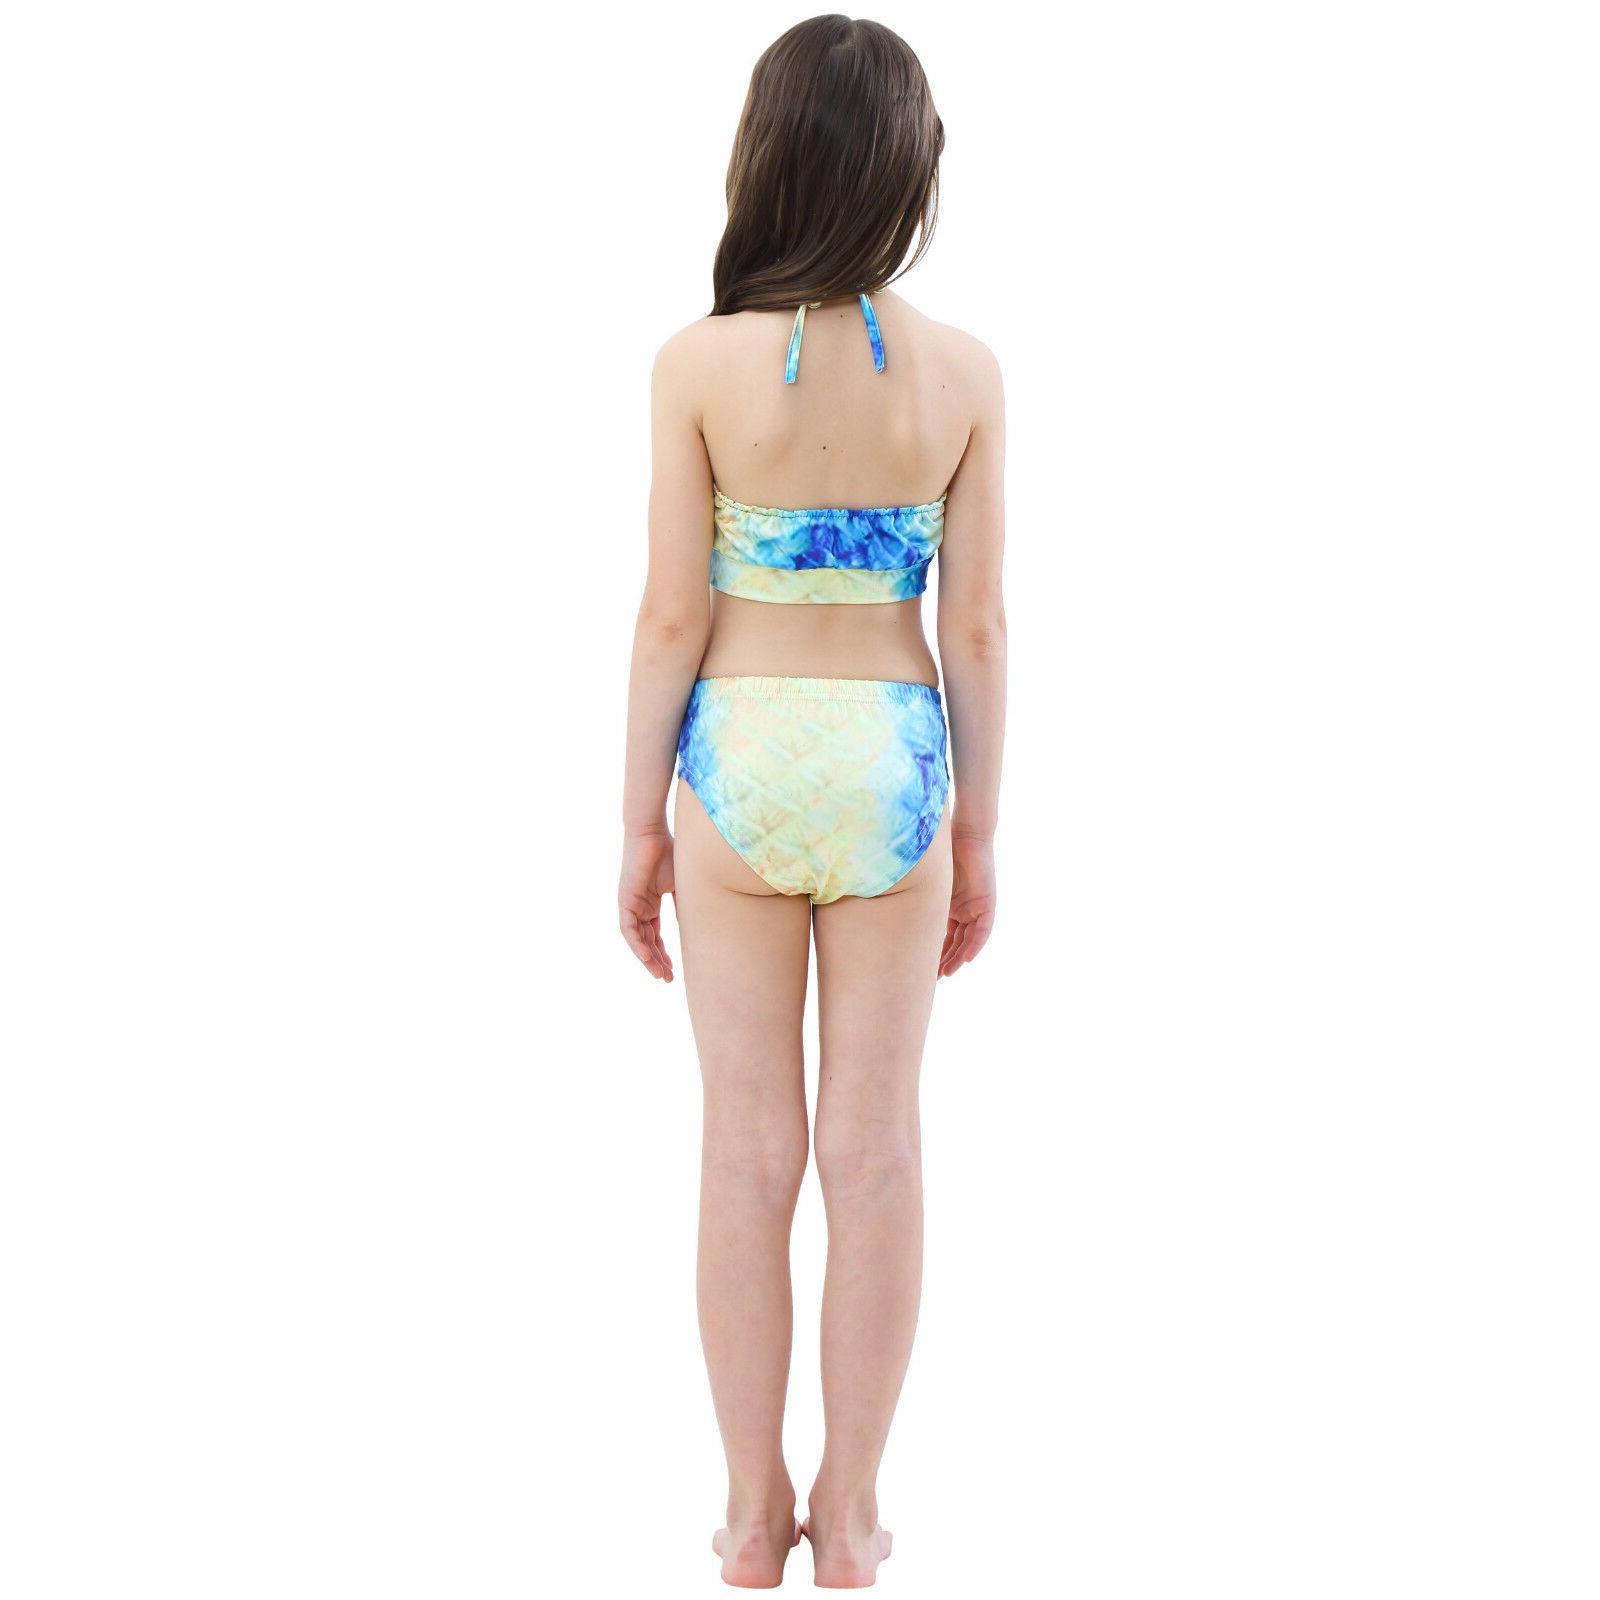 Kids Girl Mermaid Tail Bikini - Tail Swimming